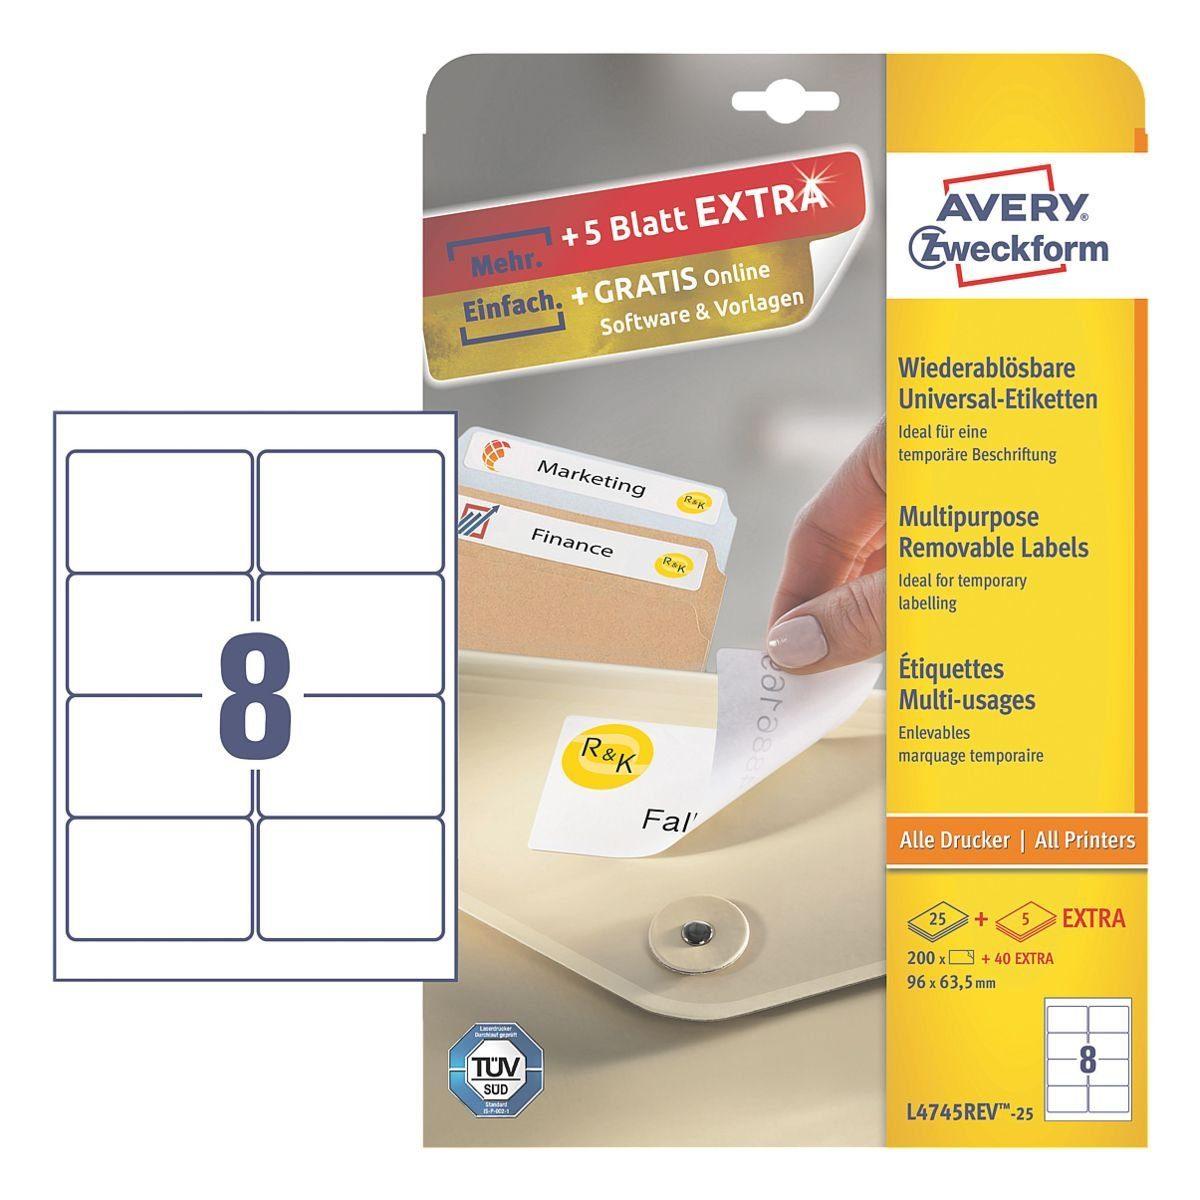 Avery Zweckform 240er-Pack Universal Klebeetiketten »L4745REV-25«